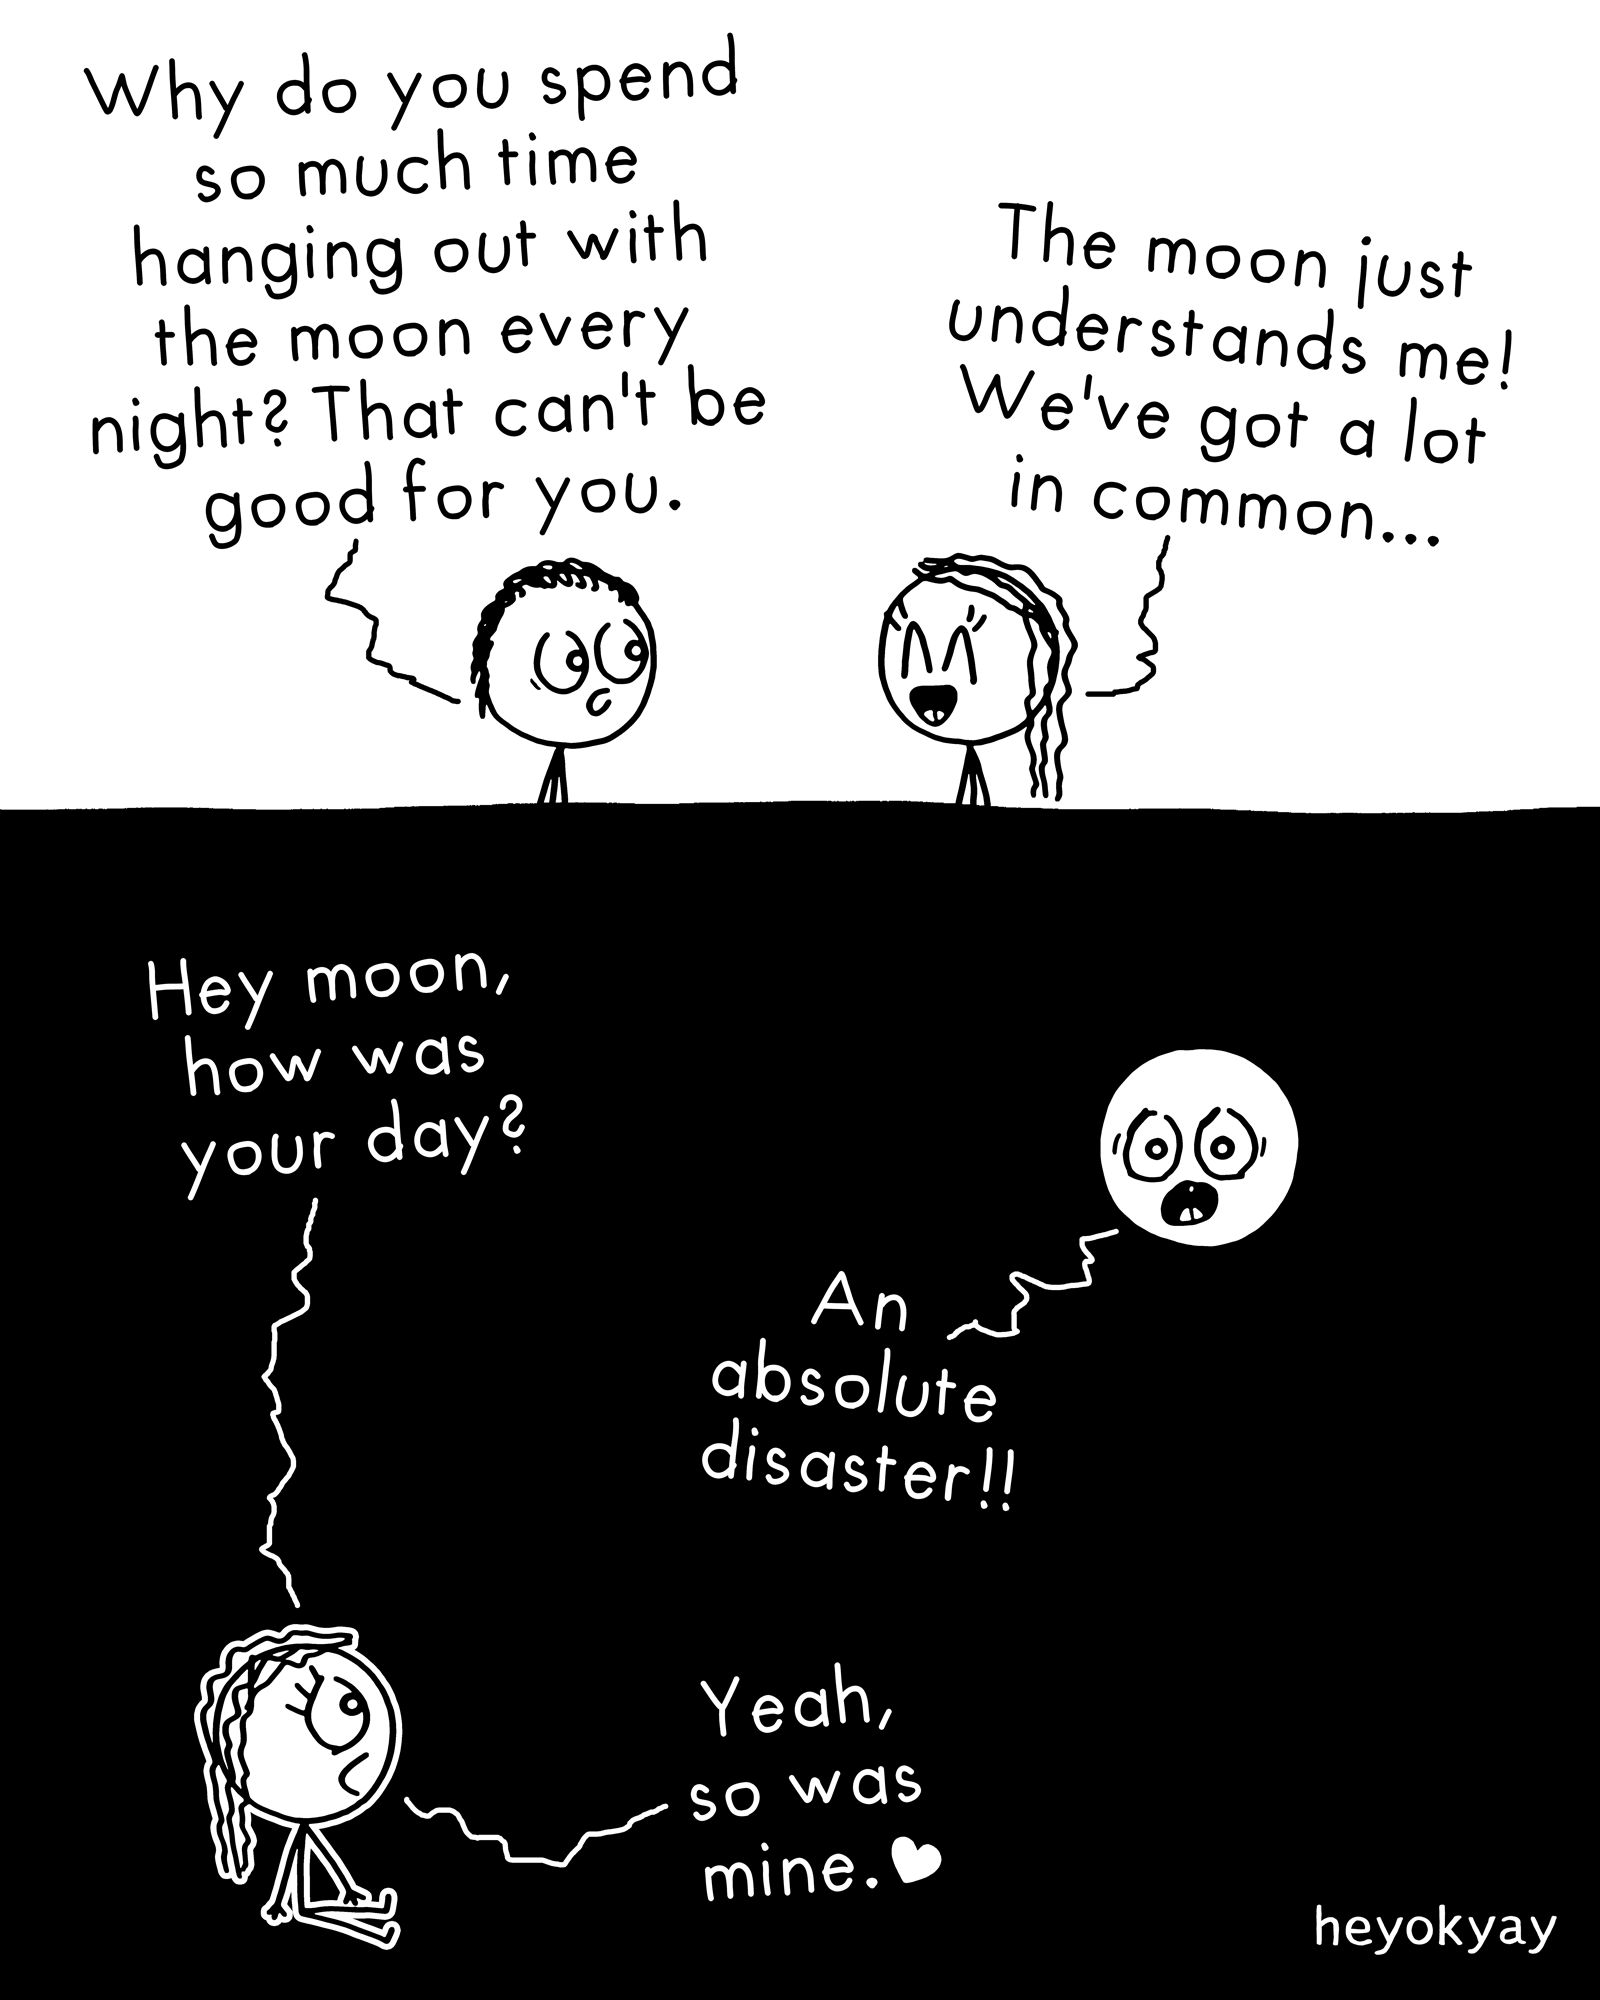 Moon heyokyay comic